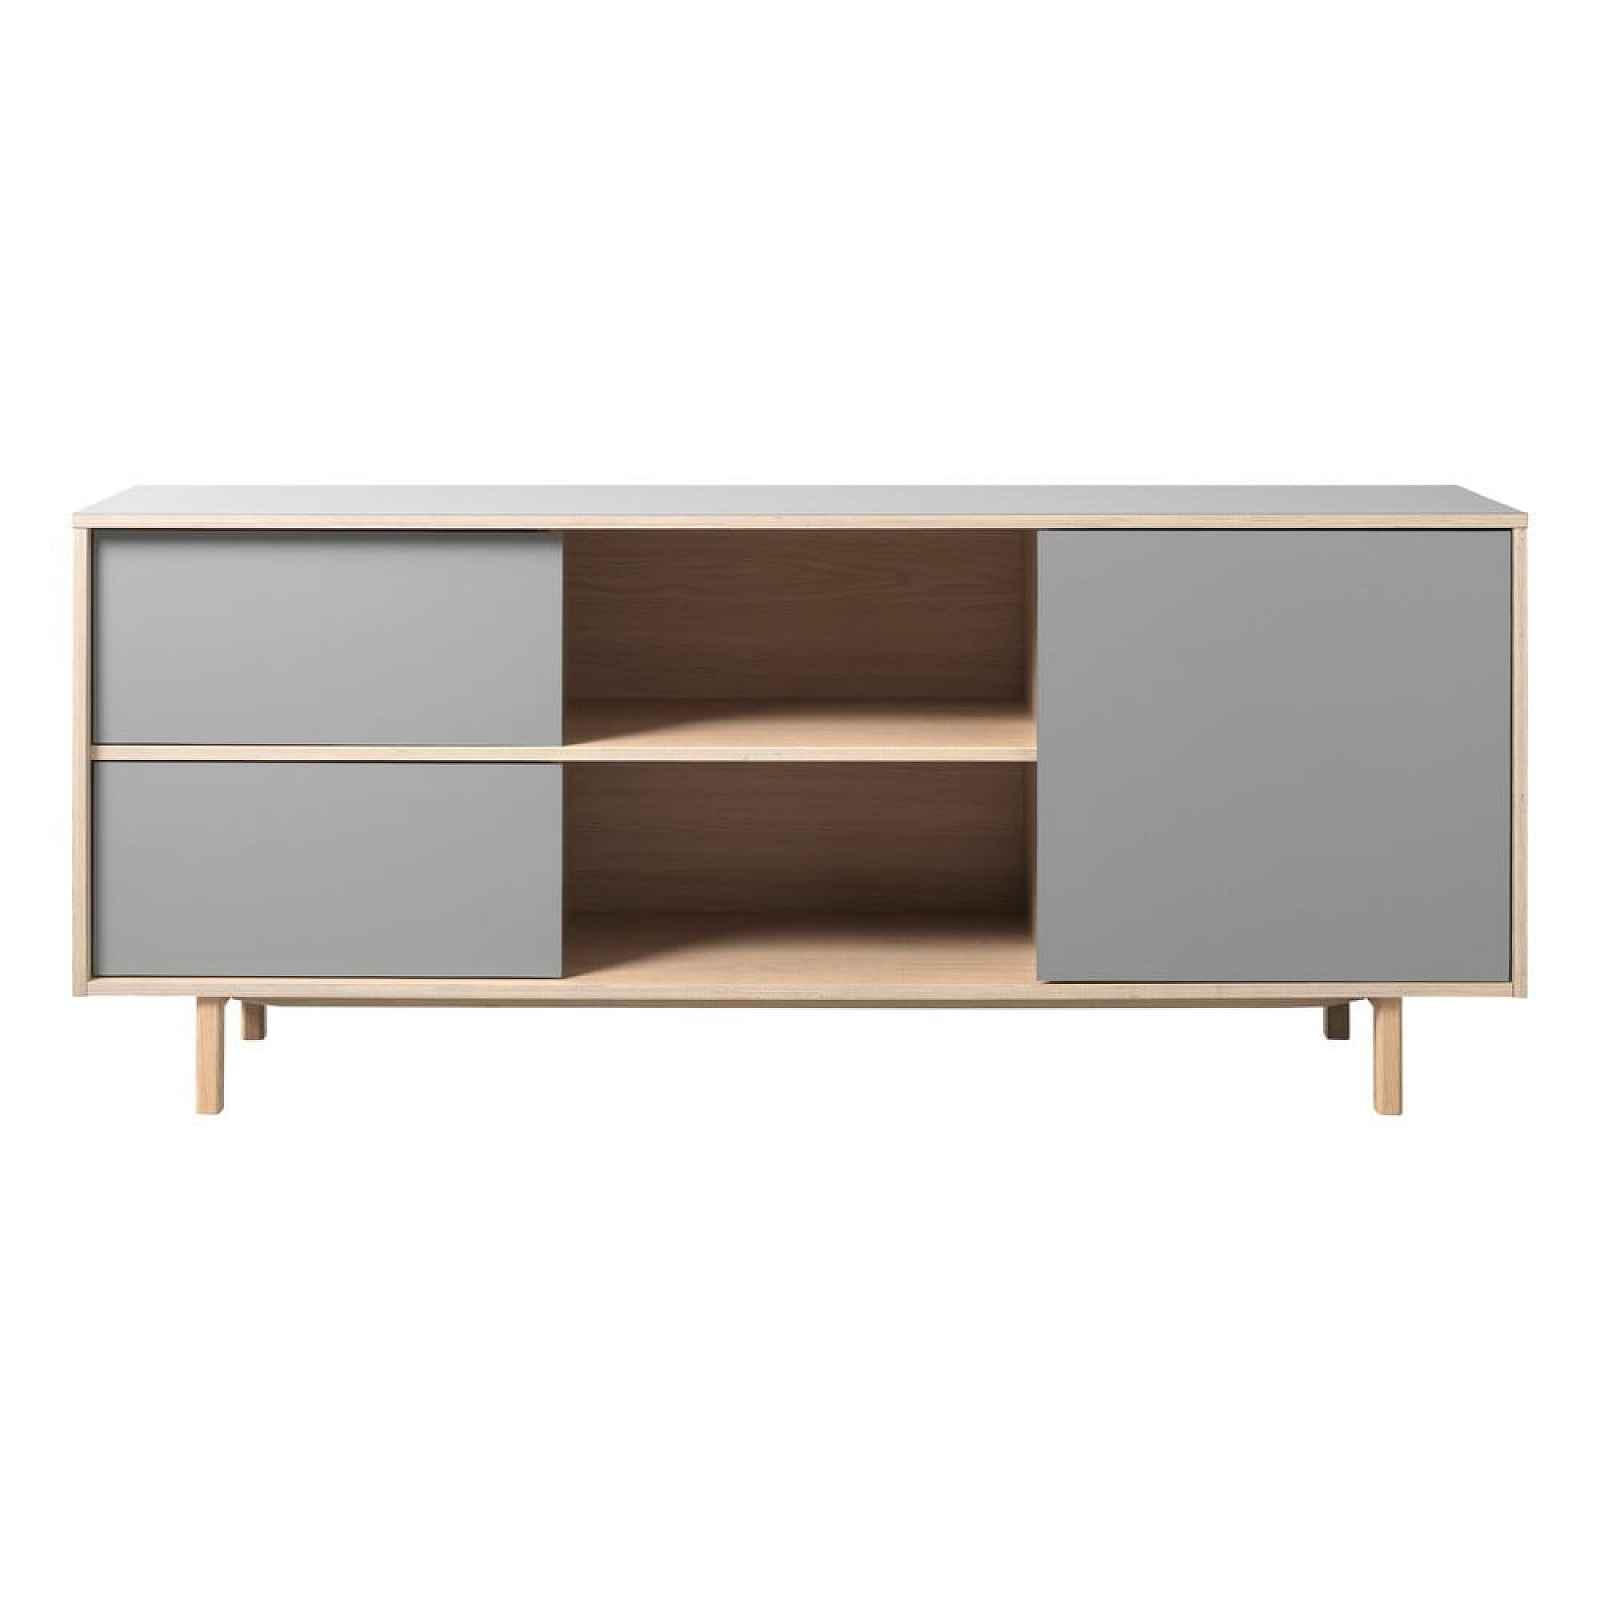 Šedá komoda s detaily v dubovém dekoru Unique Furniture Bilbao